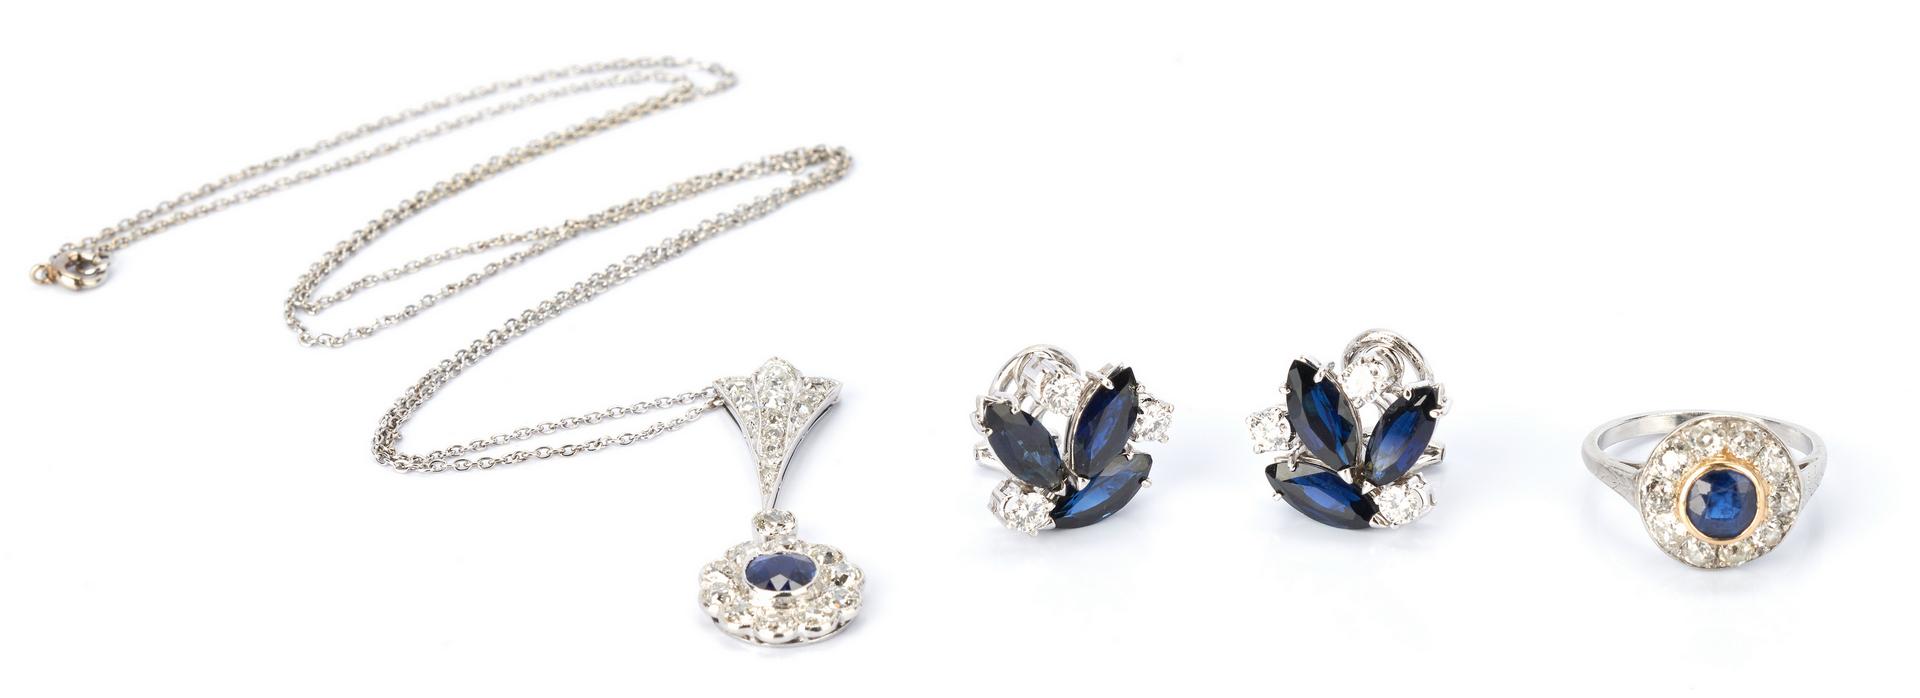 Lot 424: 14K Sapphire and Diamond 4 Piece Jewelry Set